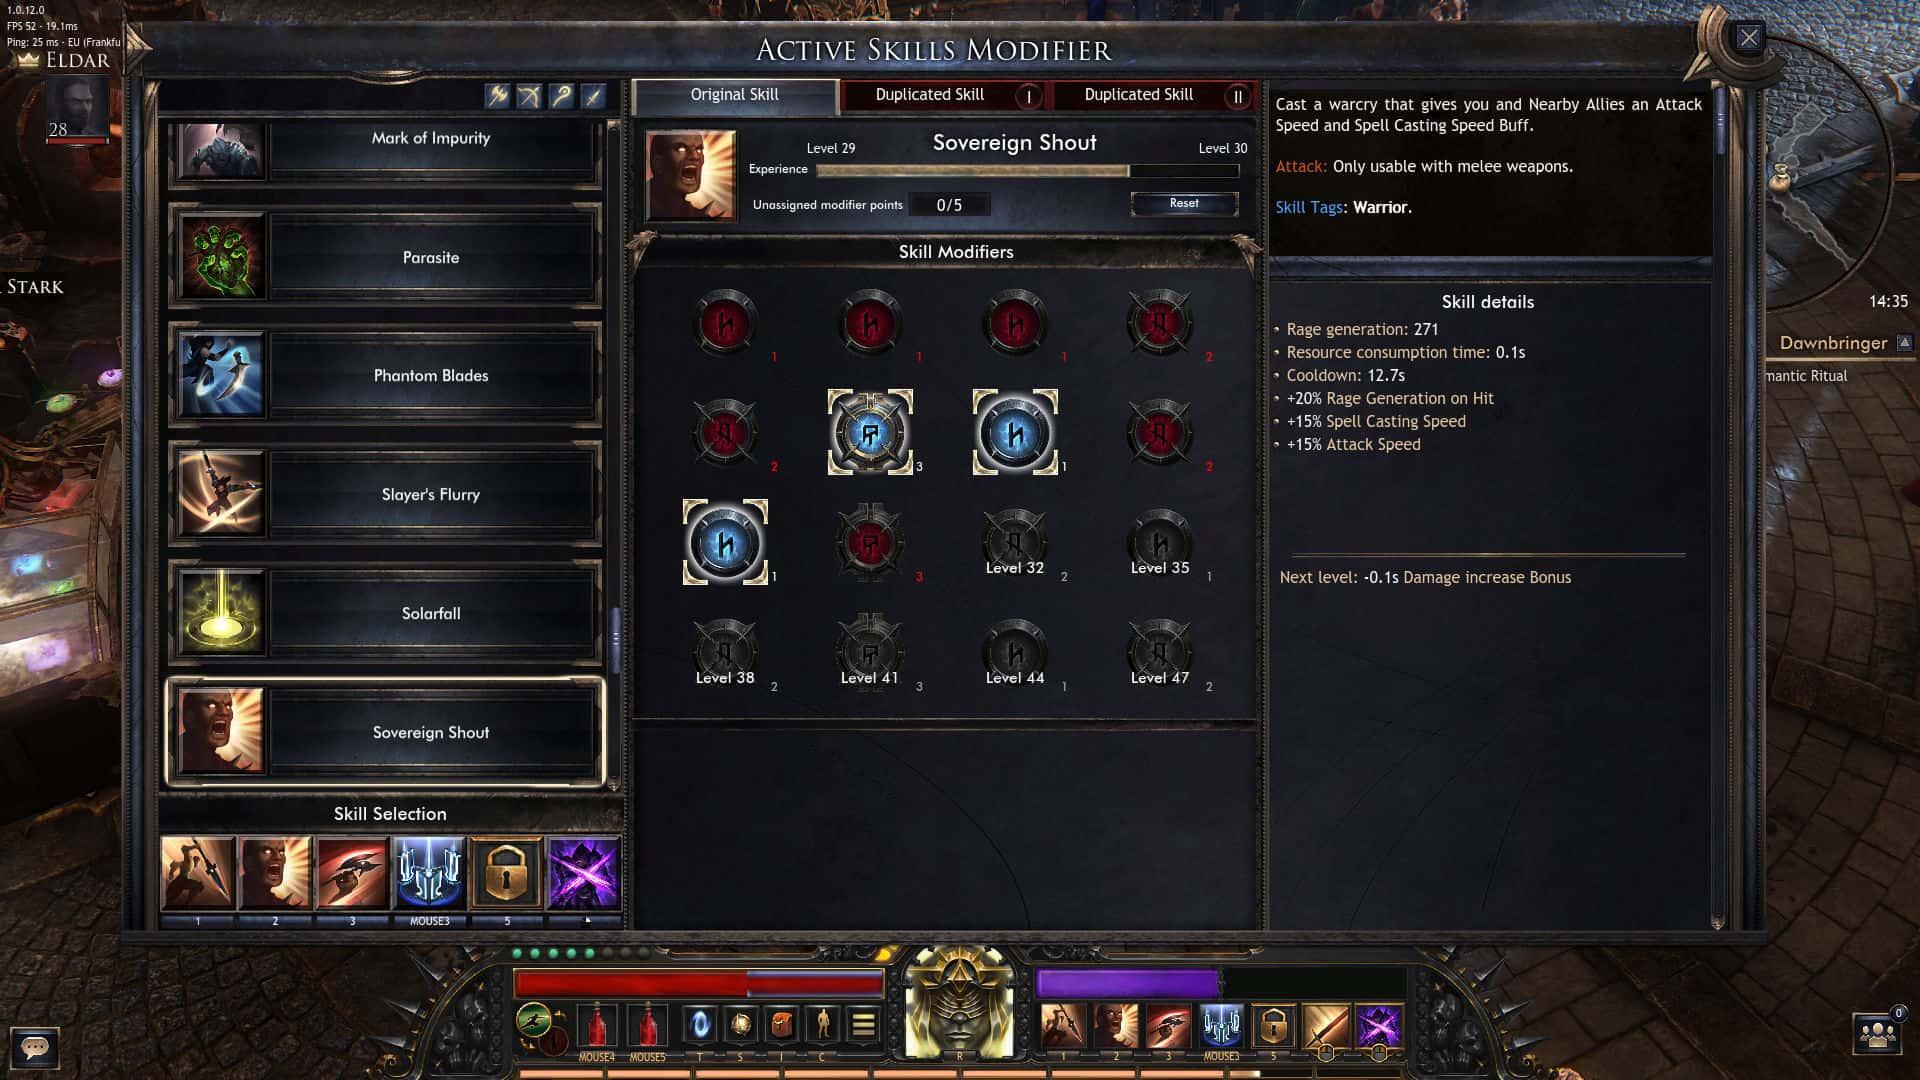 Wolcen: Lords of Mayhem abilità attive